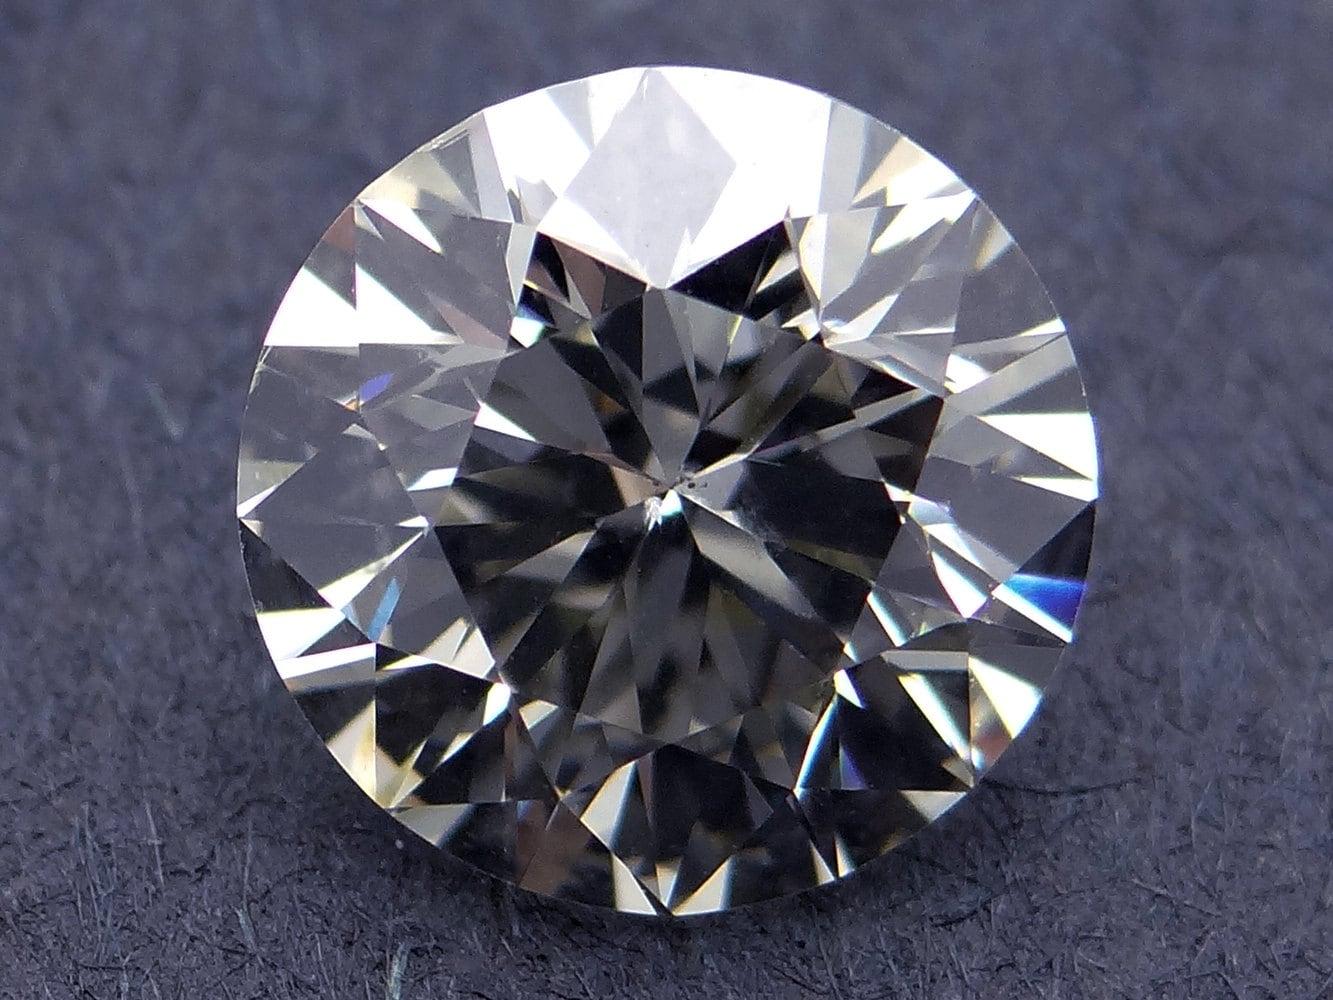 GIA Certified Loose 2.02ct Round Brilliant Cut Diamond N SI1